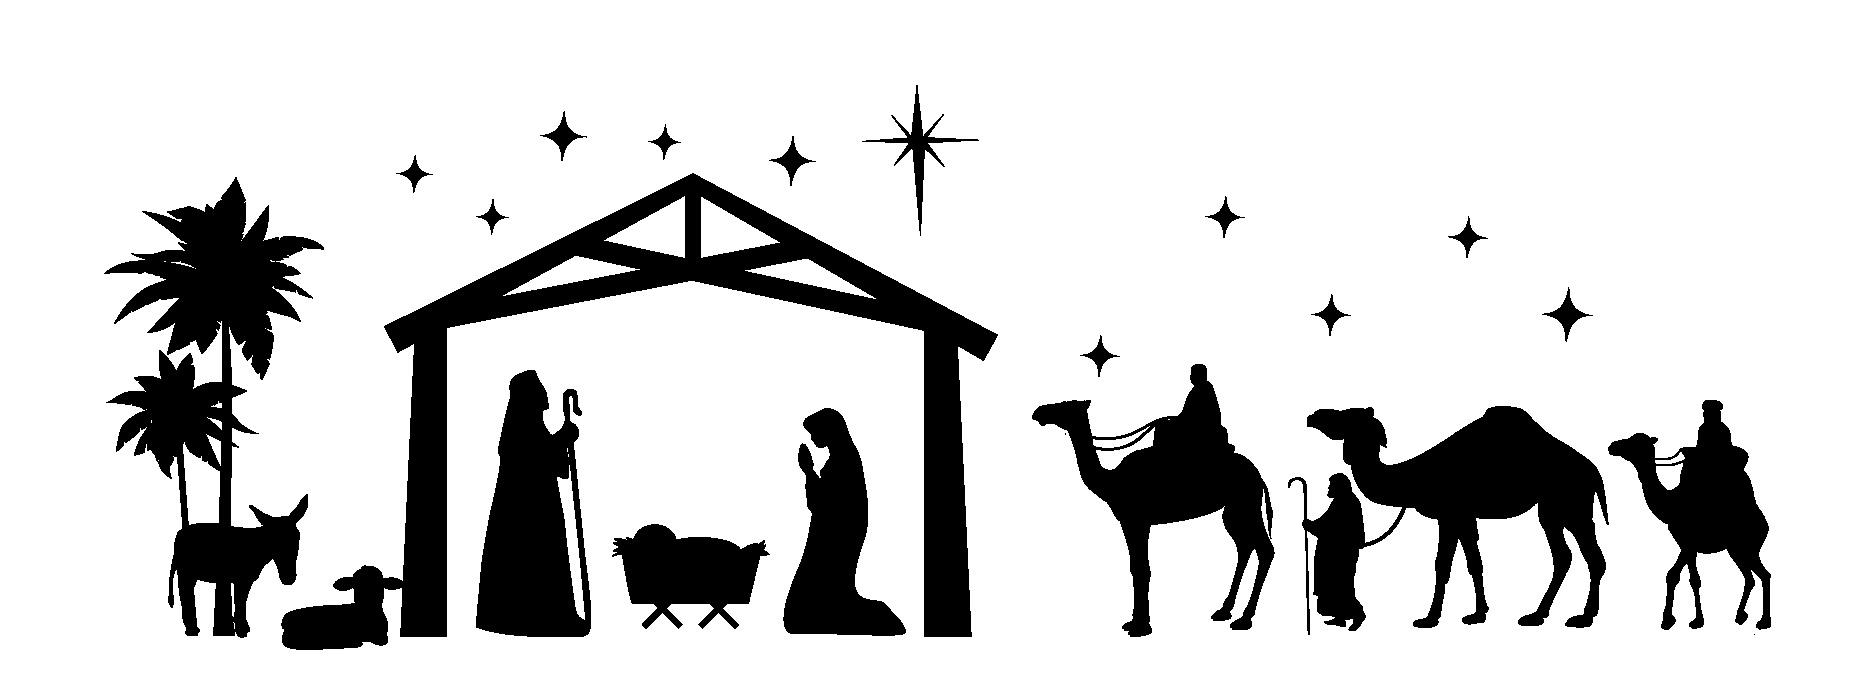 kisspng-nativity-scene-manger-nativity-of-jesus-bethlehem-wise-man-5ac6980abaee73.2779462215229644907657.jpg